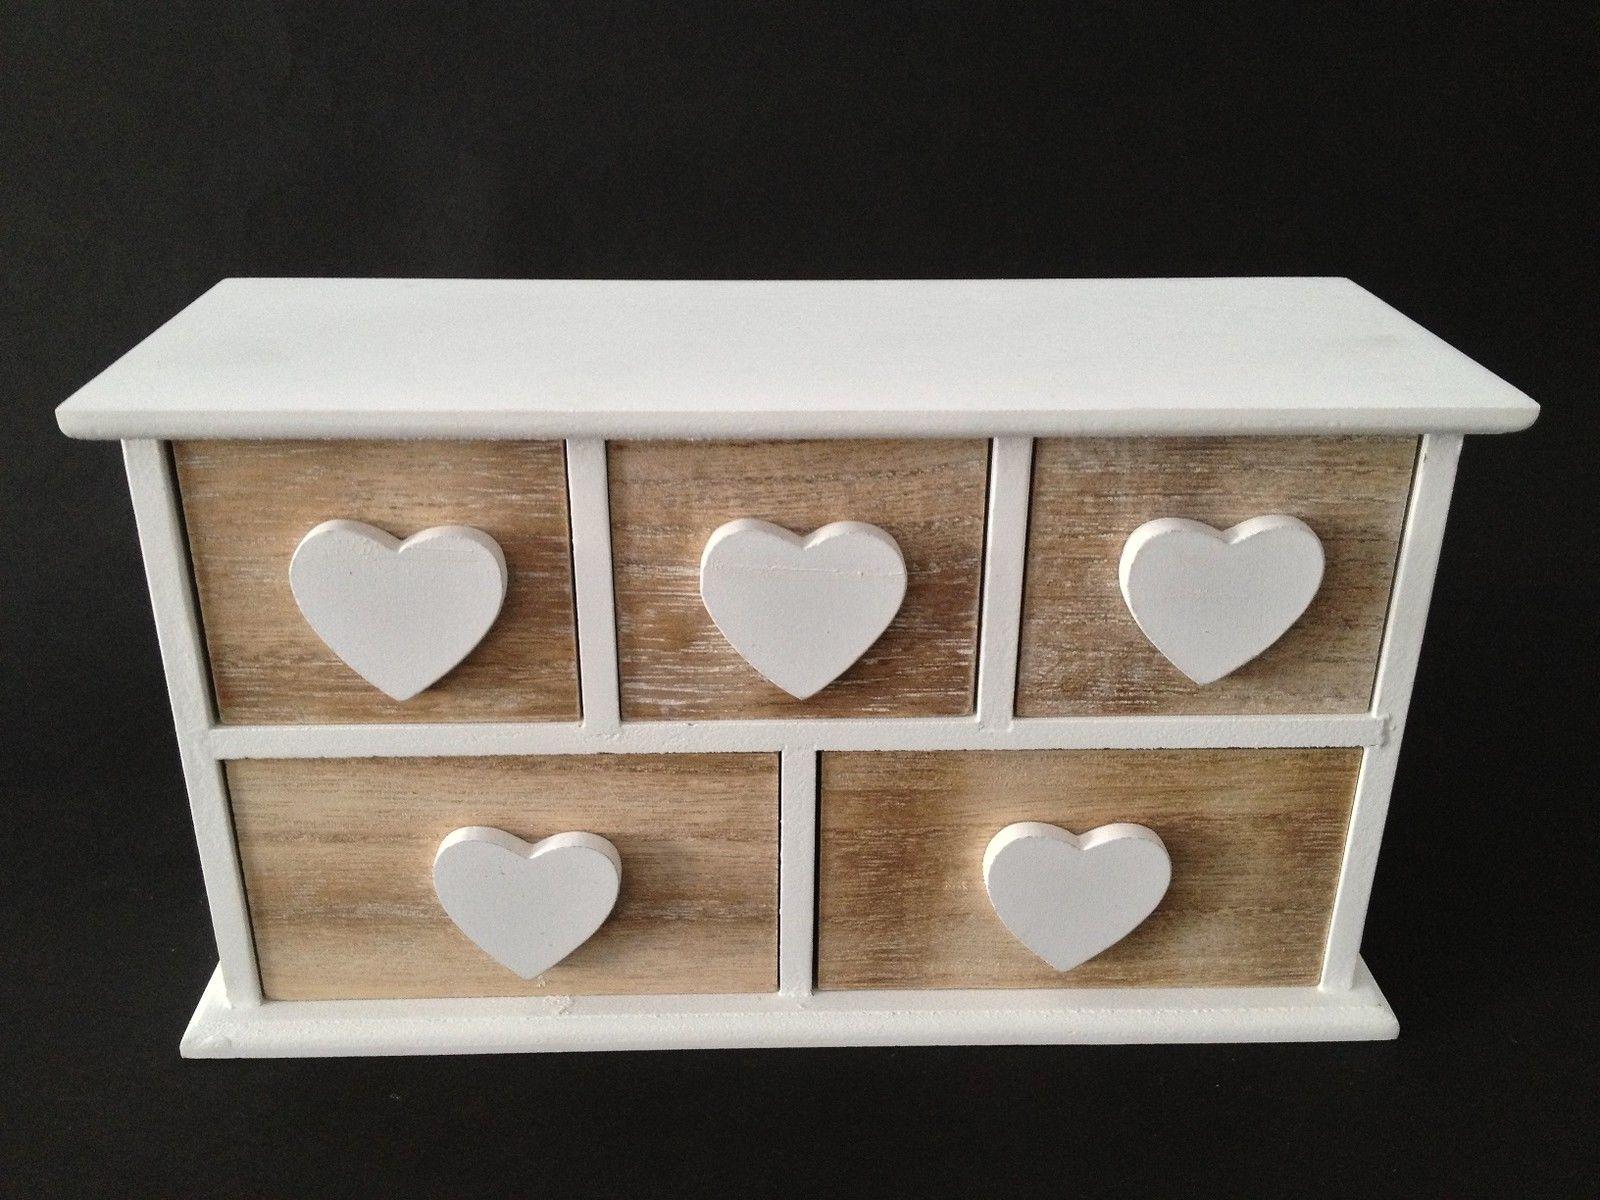 Minikommode Kommode 5 Schubladen Sortierregal Regal Herz